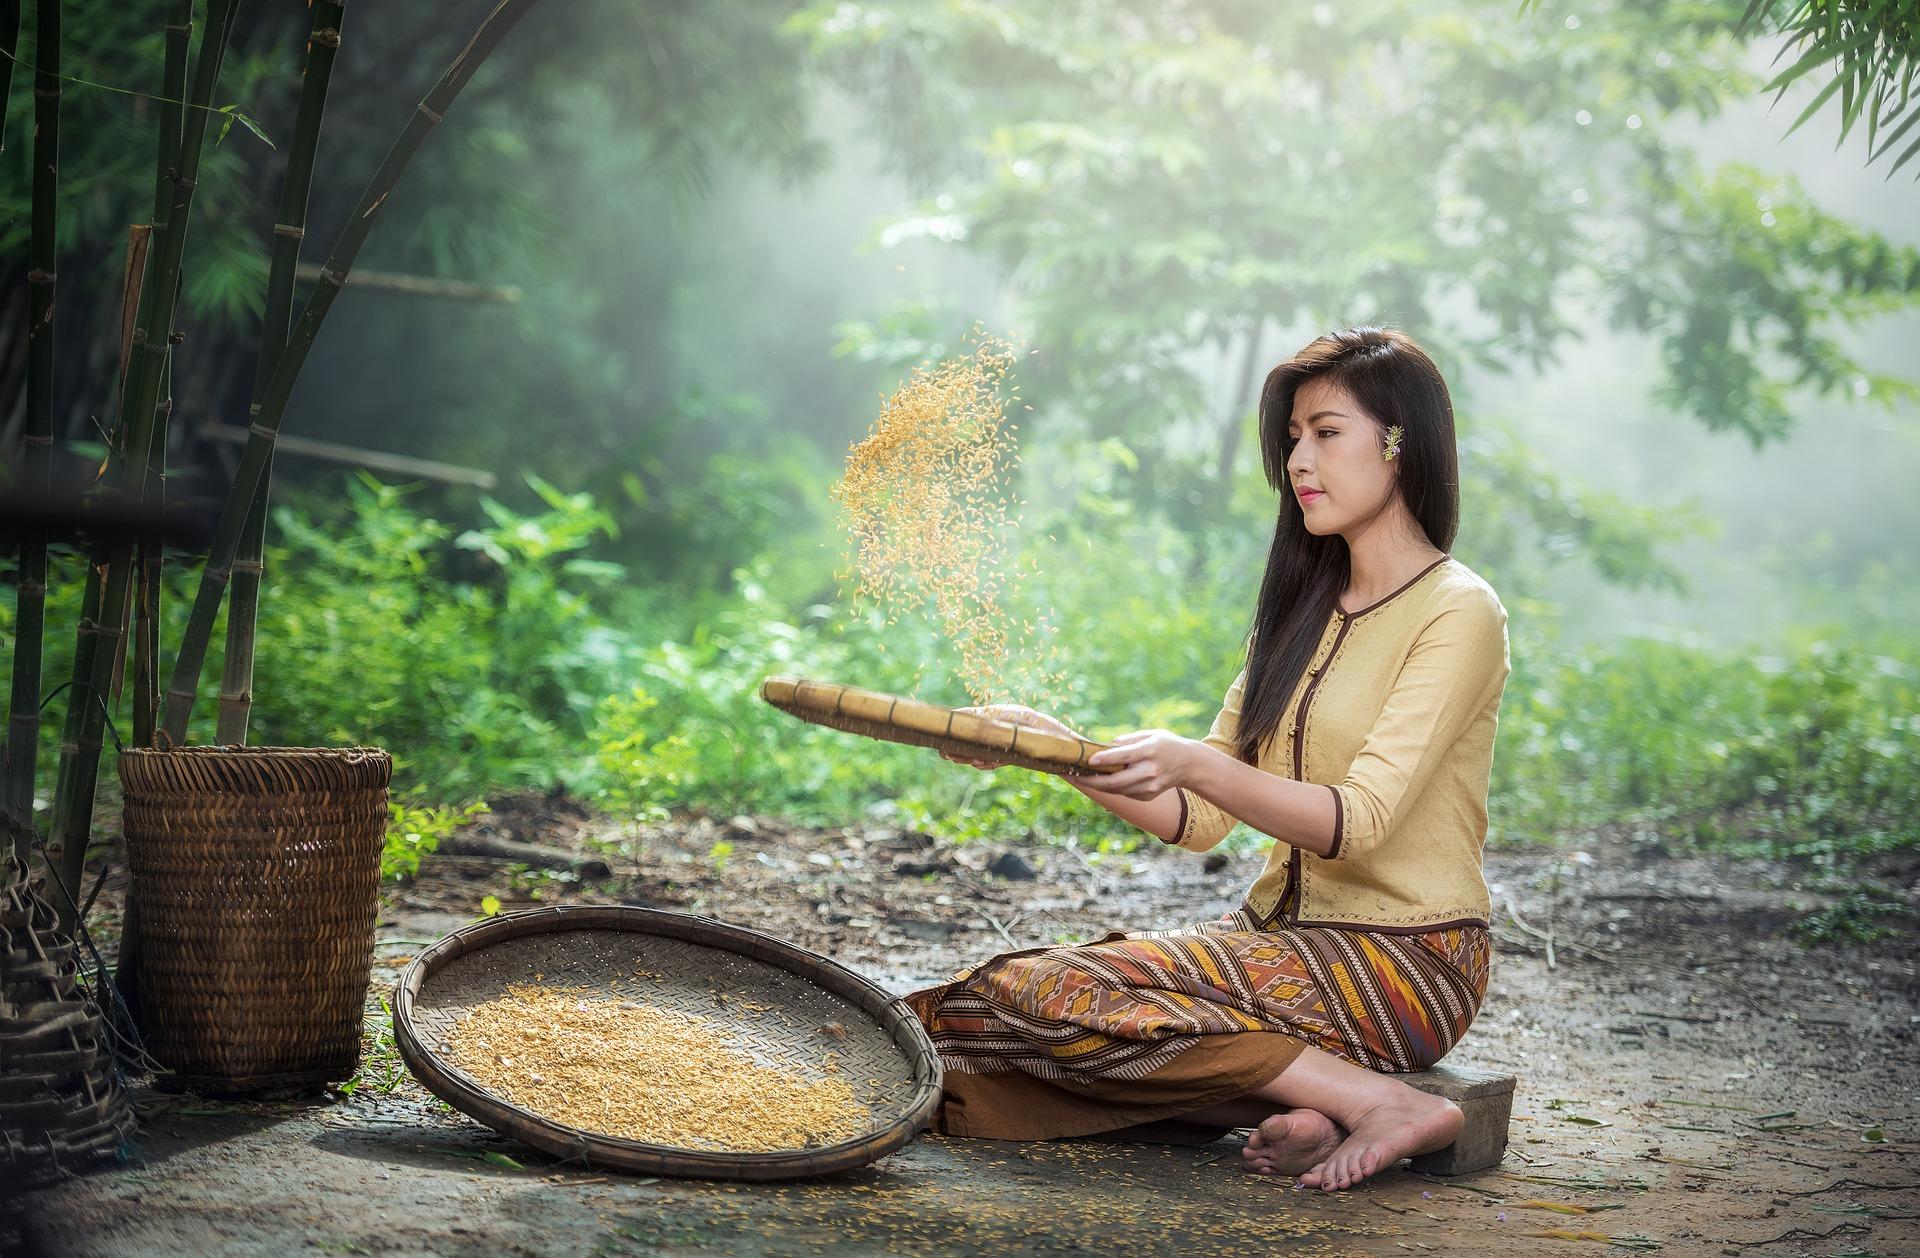 rice-1807554_1920